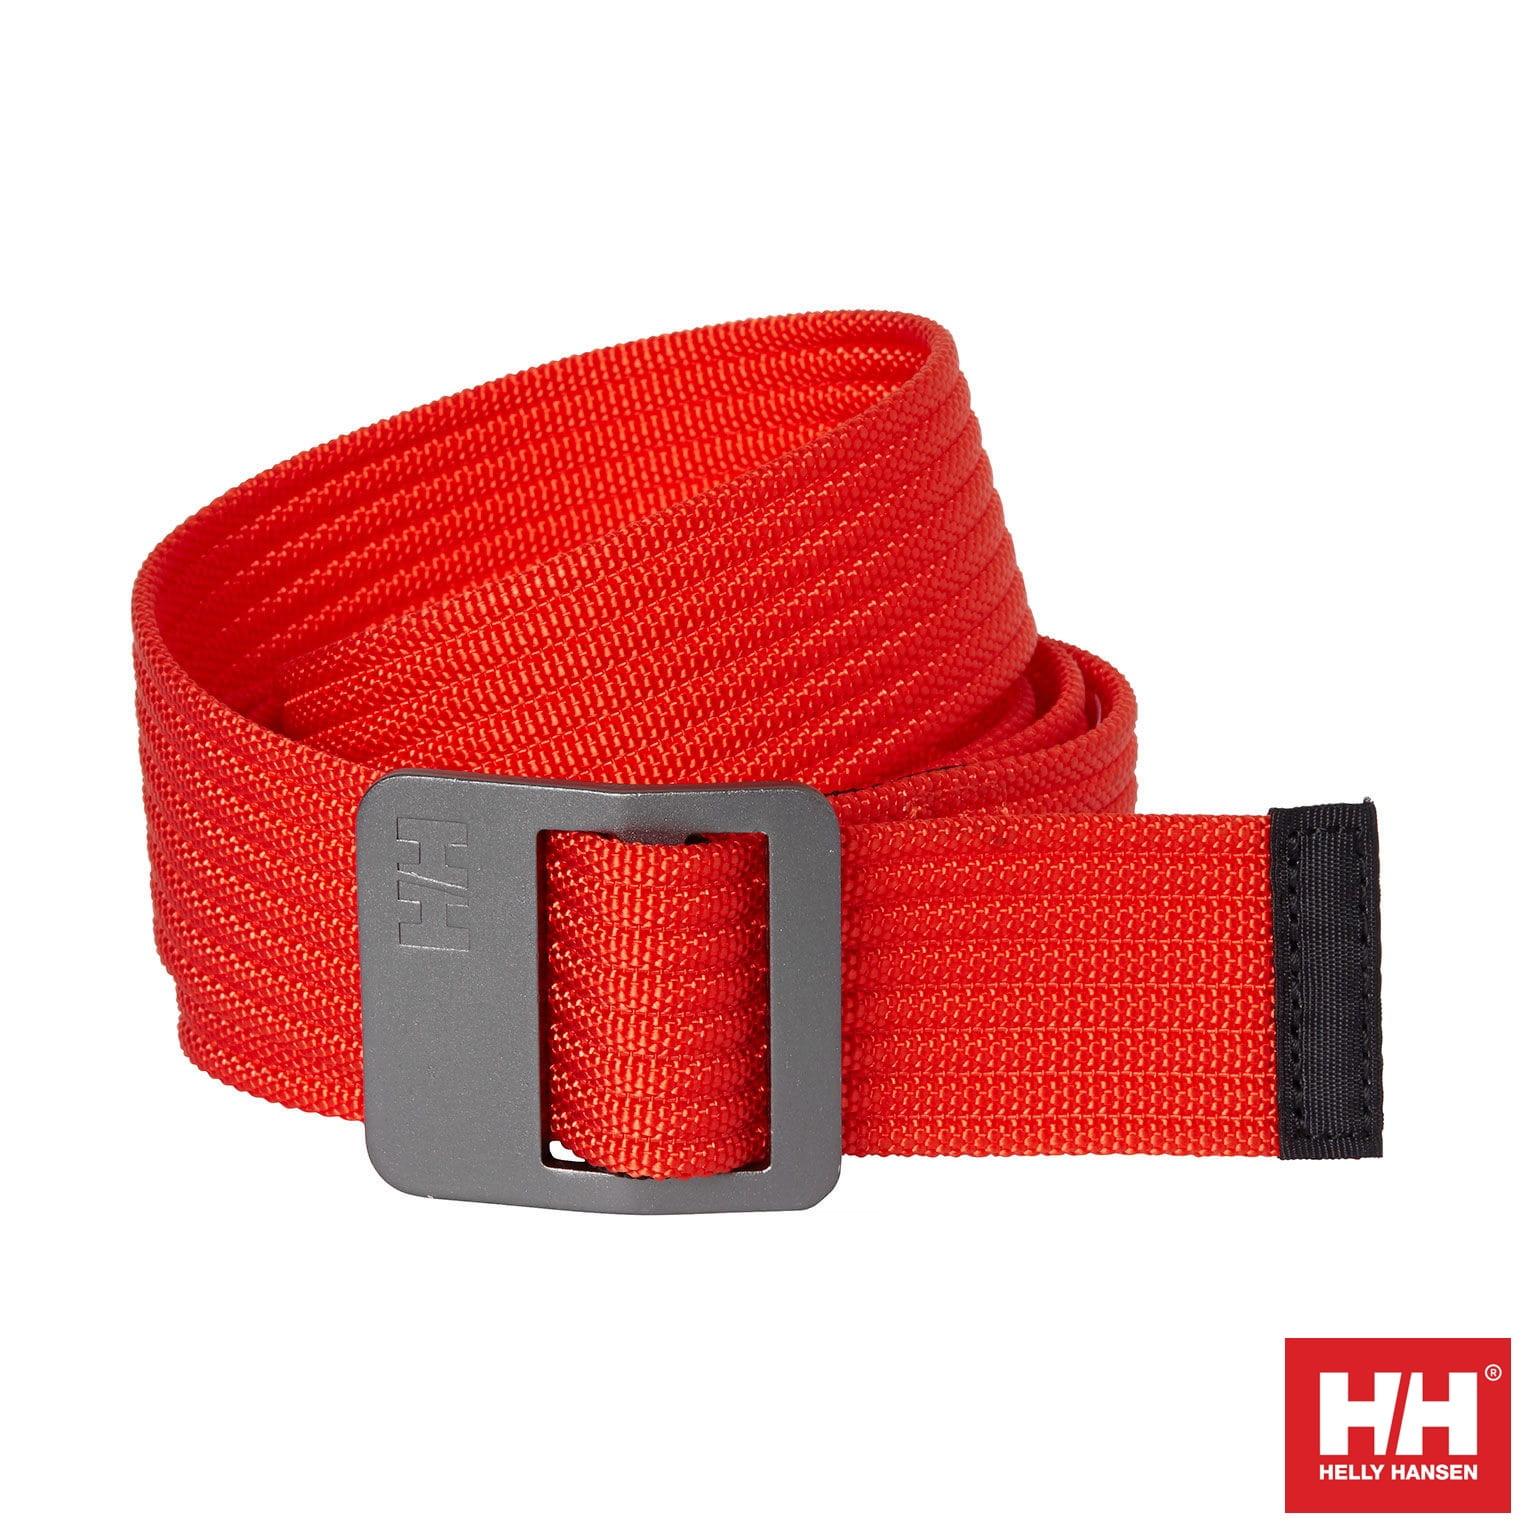 9d8525fc1f8962 Helly Hansen Pasek (67363) WEBBING czerwony 130cm Sklep żeglarski i ...